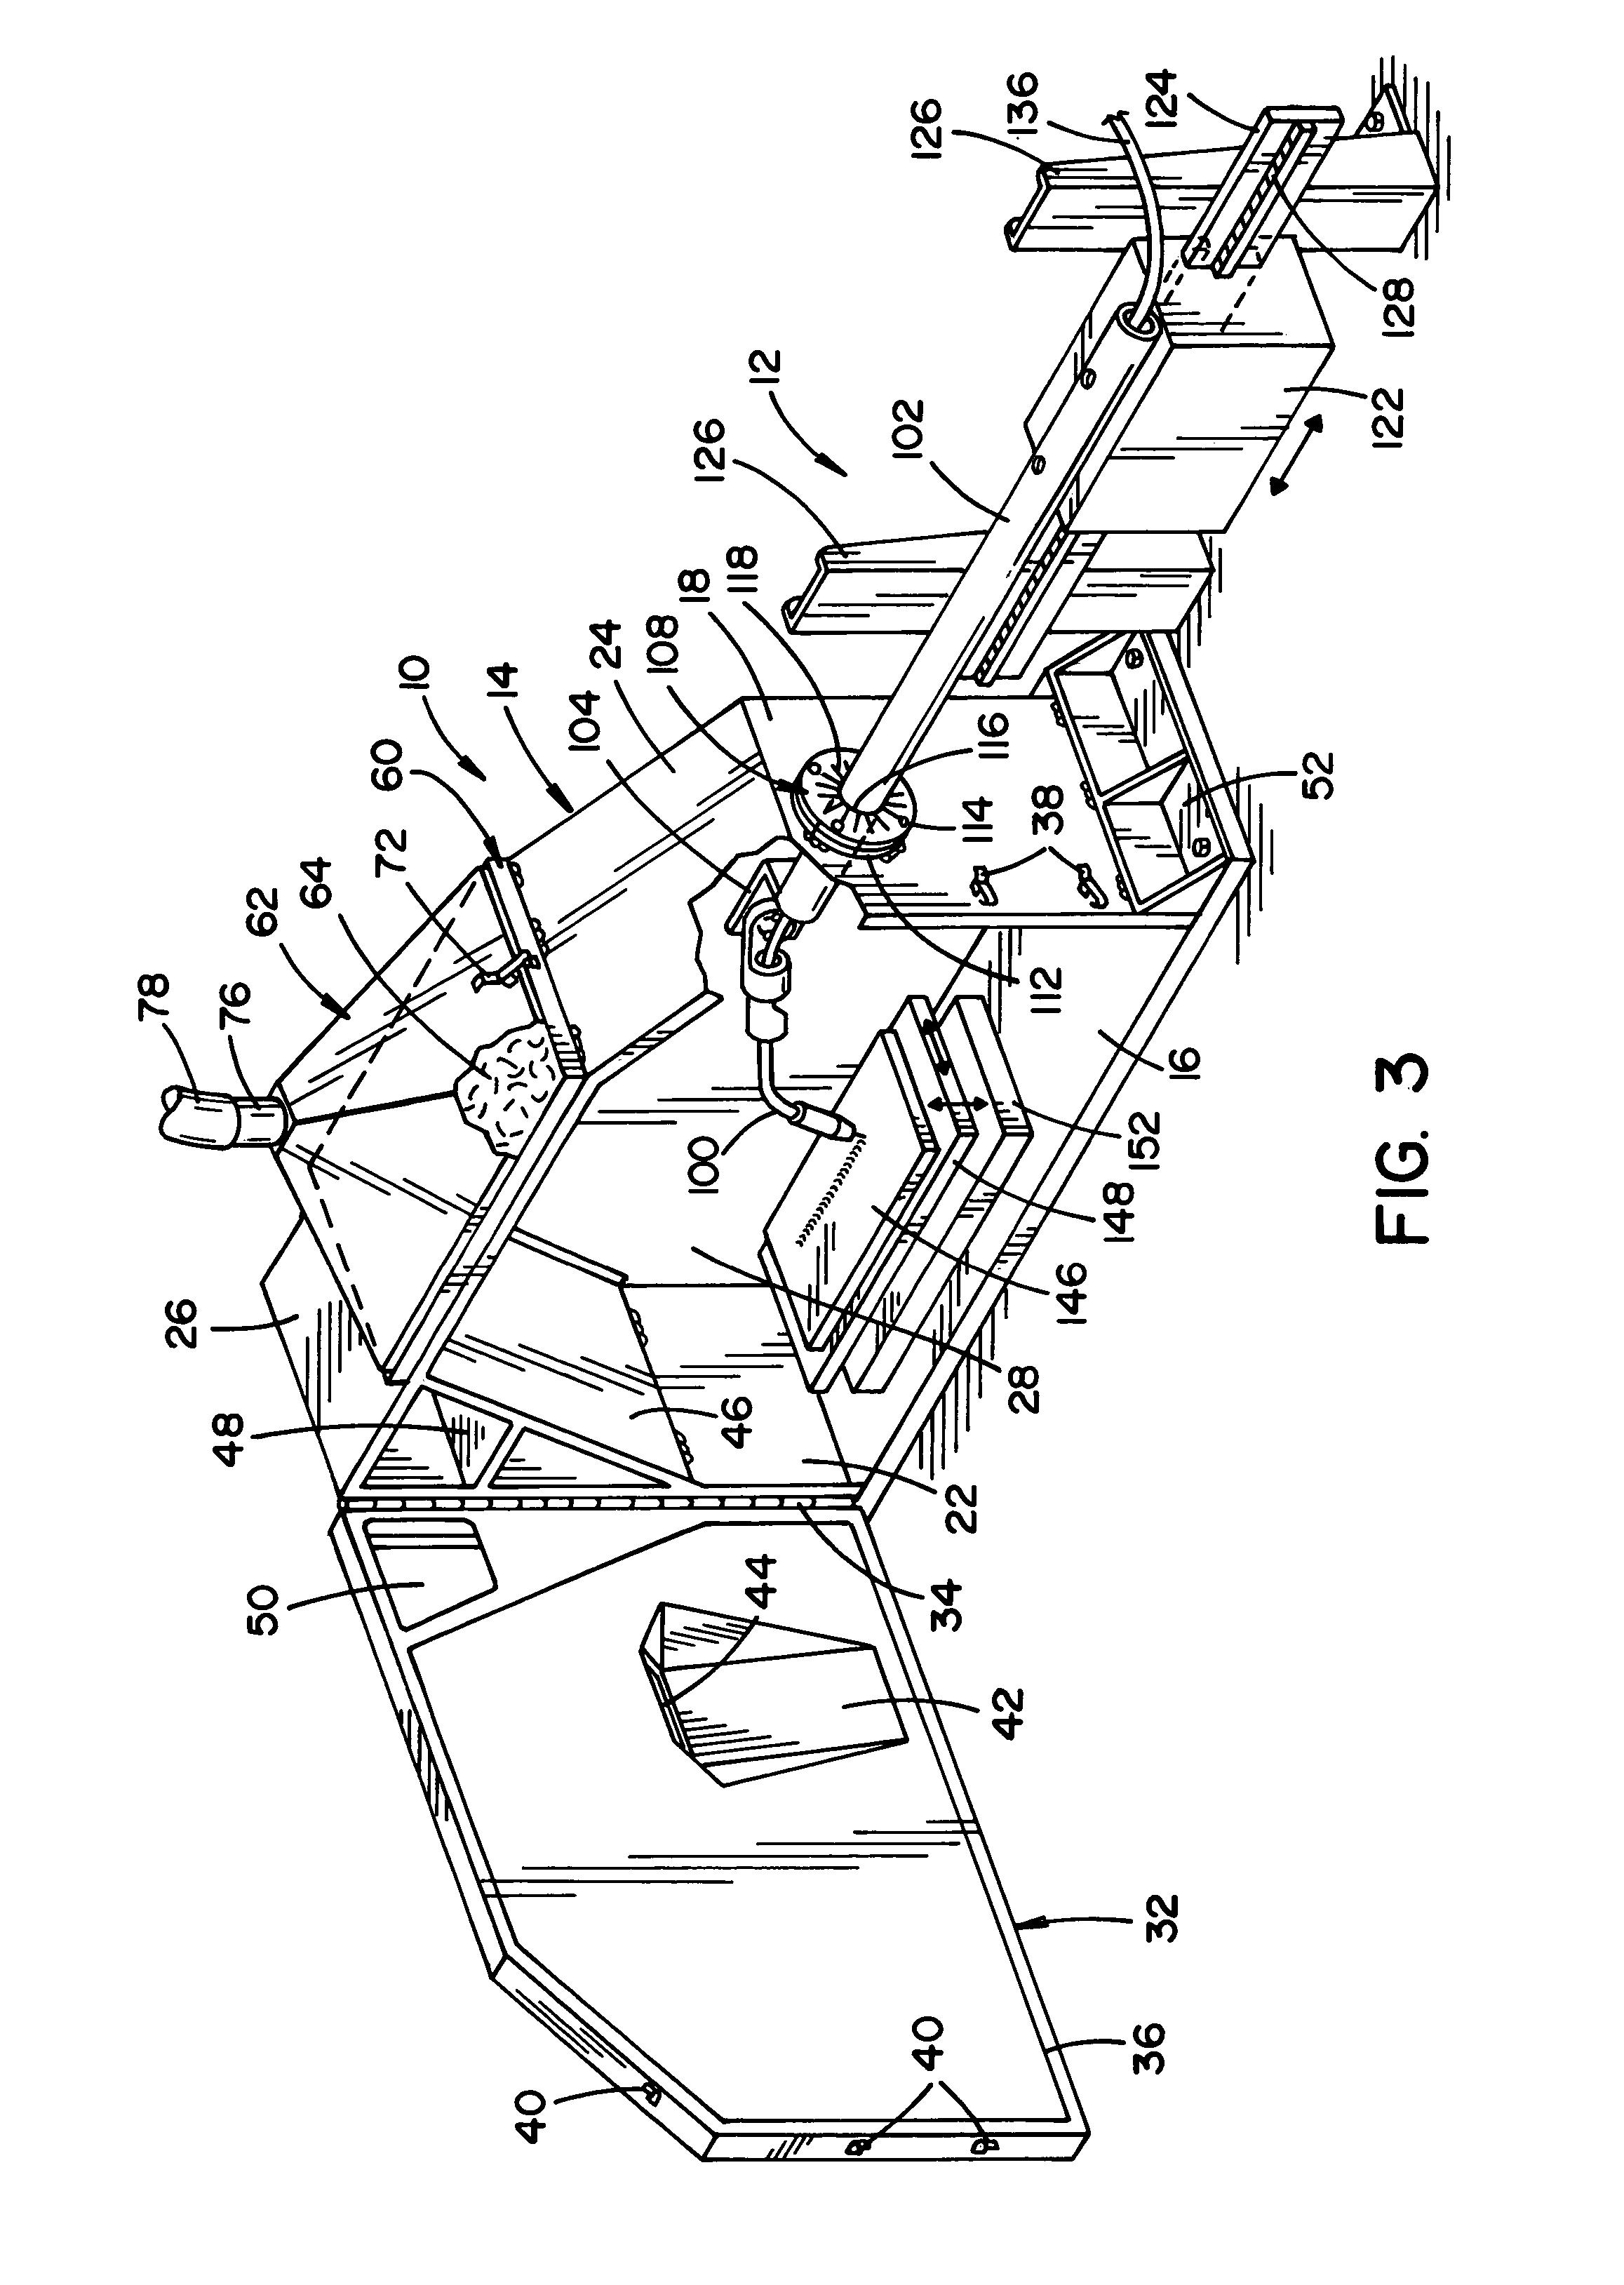 patent us7503951 - fume chamber